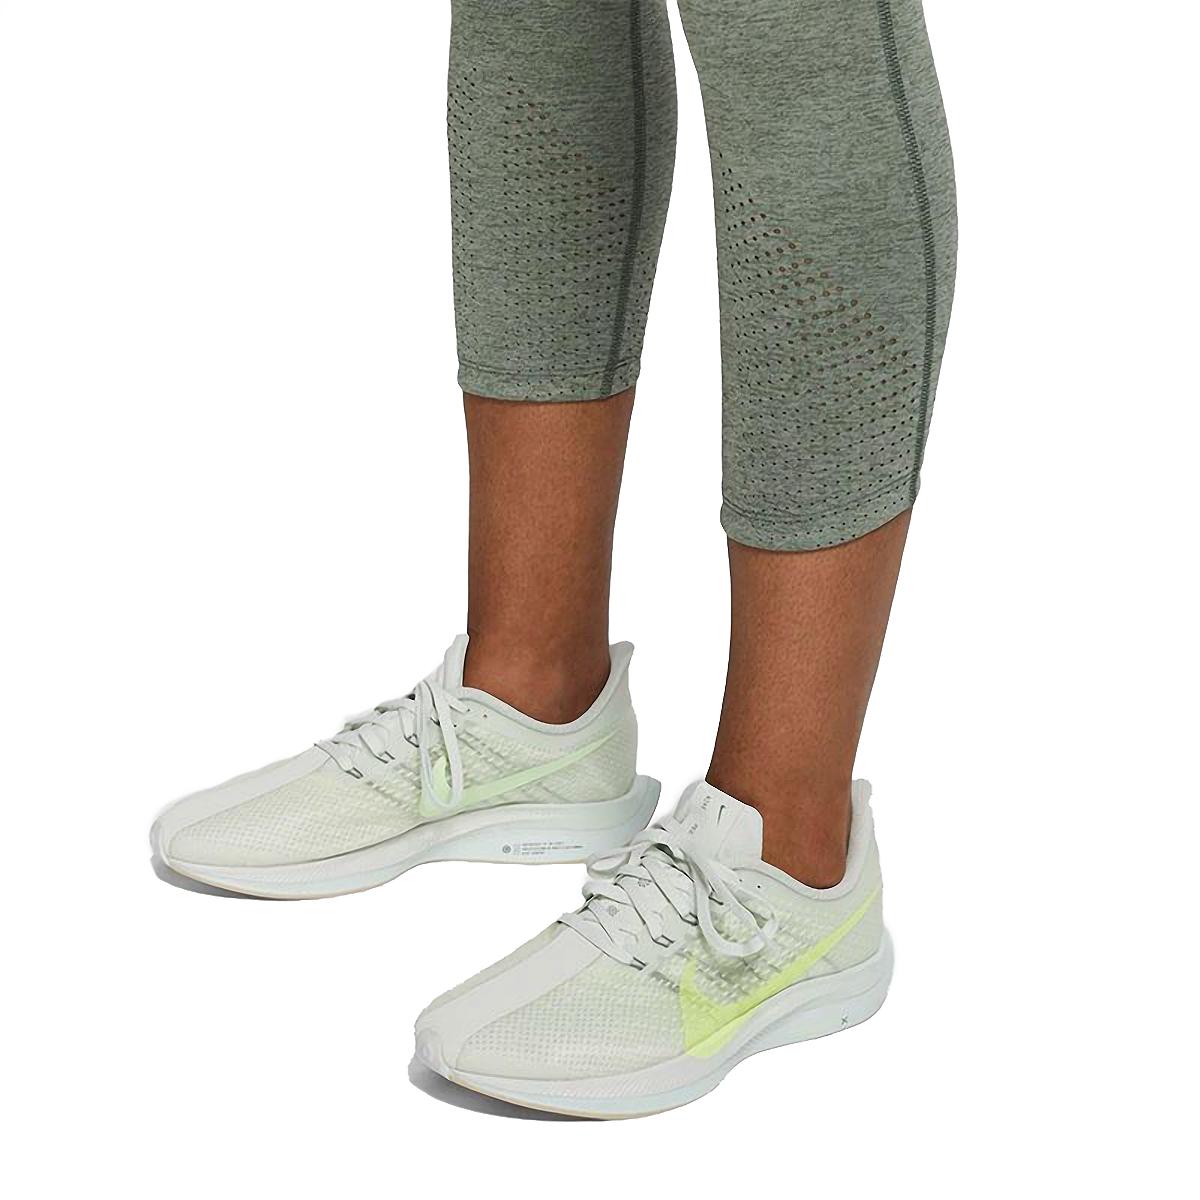 Women's Nike Epic Luxe Crop   - Color: Juniper Fog - Size: XL, Juniper Fog, large, image 4